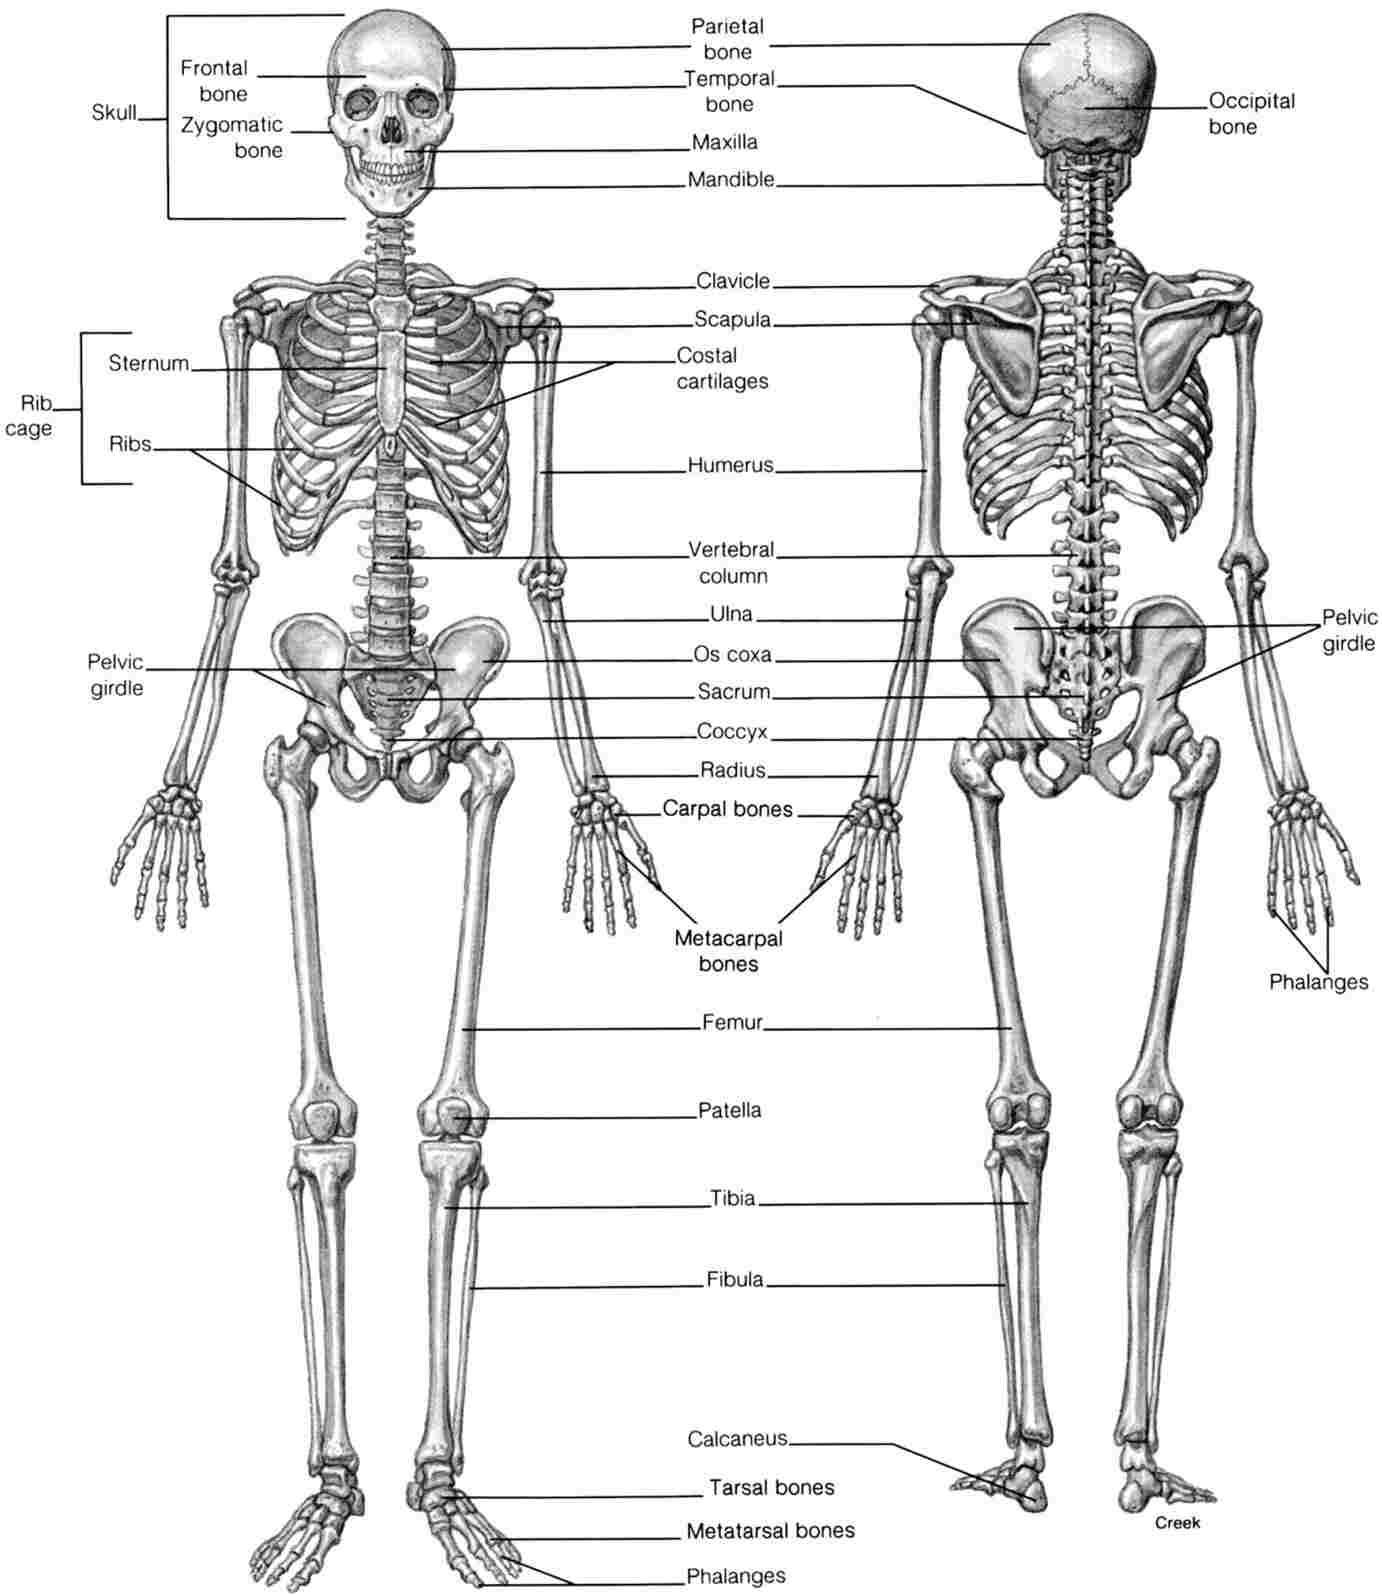 Skeletal System Diagram Human Skeletal System Drawing At Paintingvalley Explore